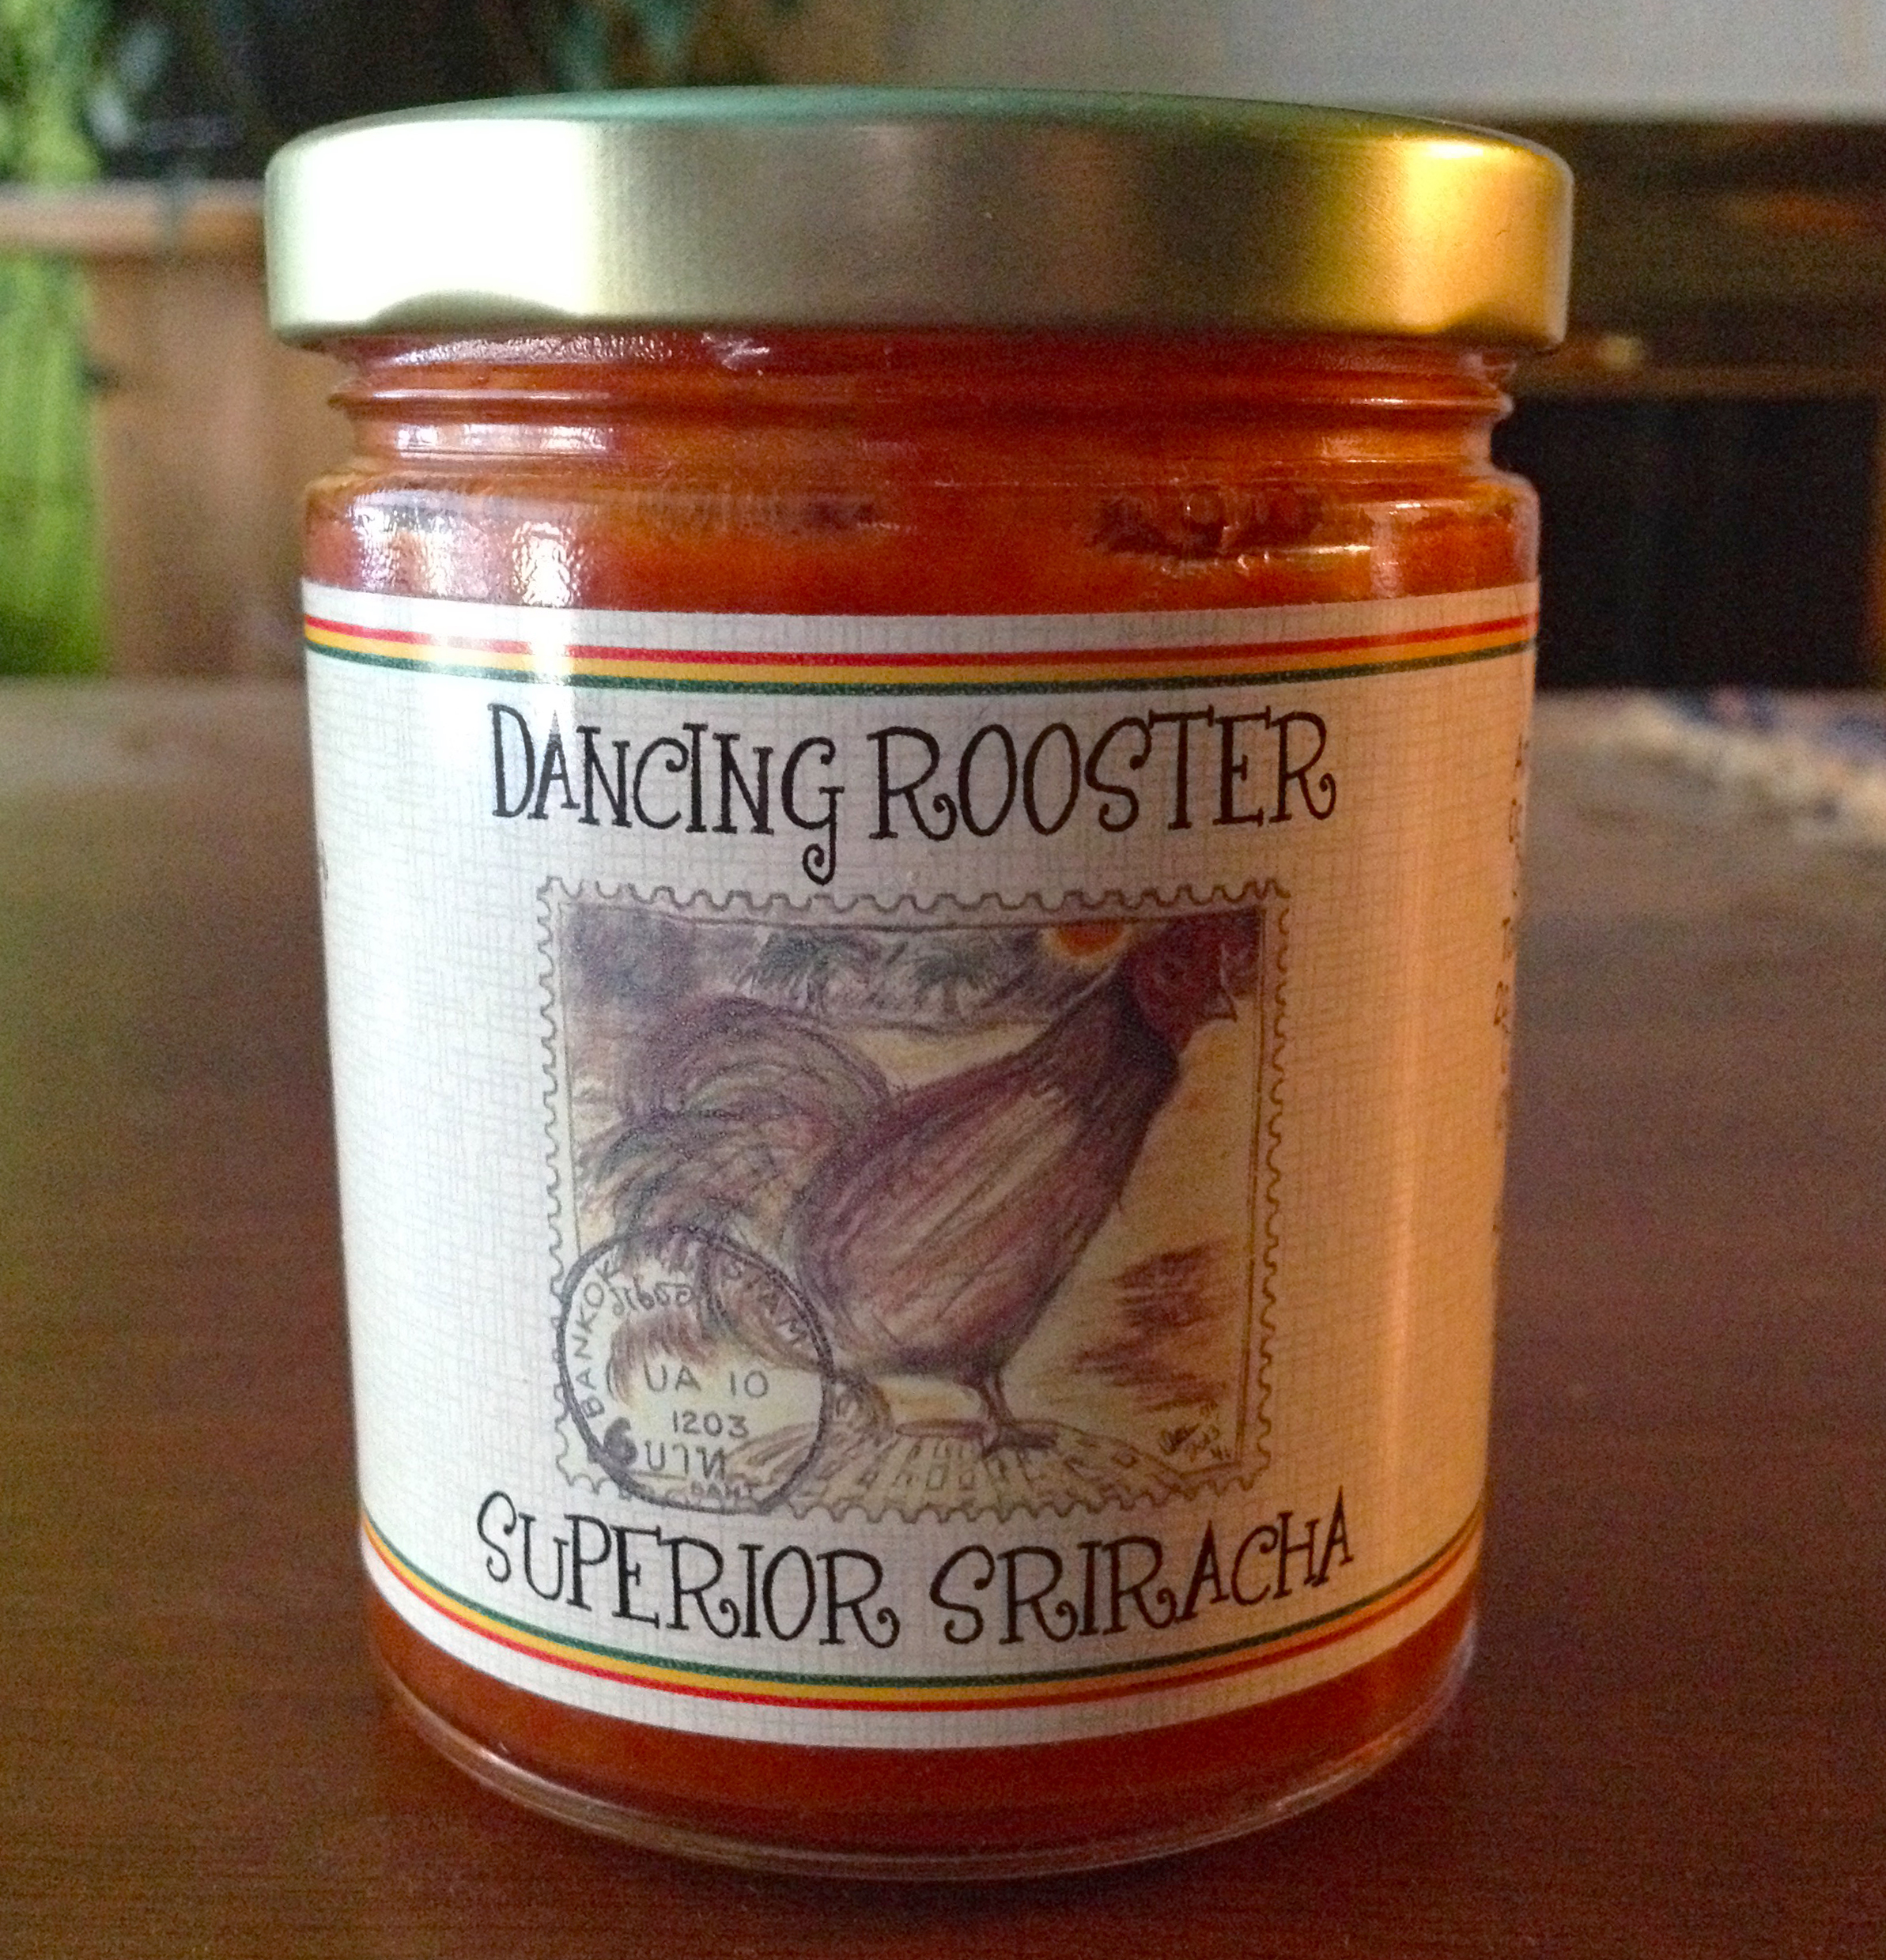 Dancing-Rooster-Superior-Sriracha.jpg